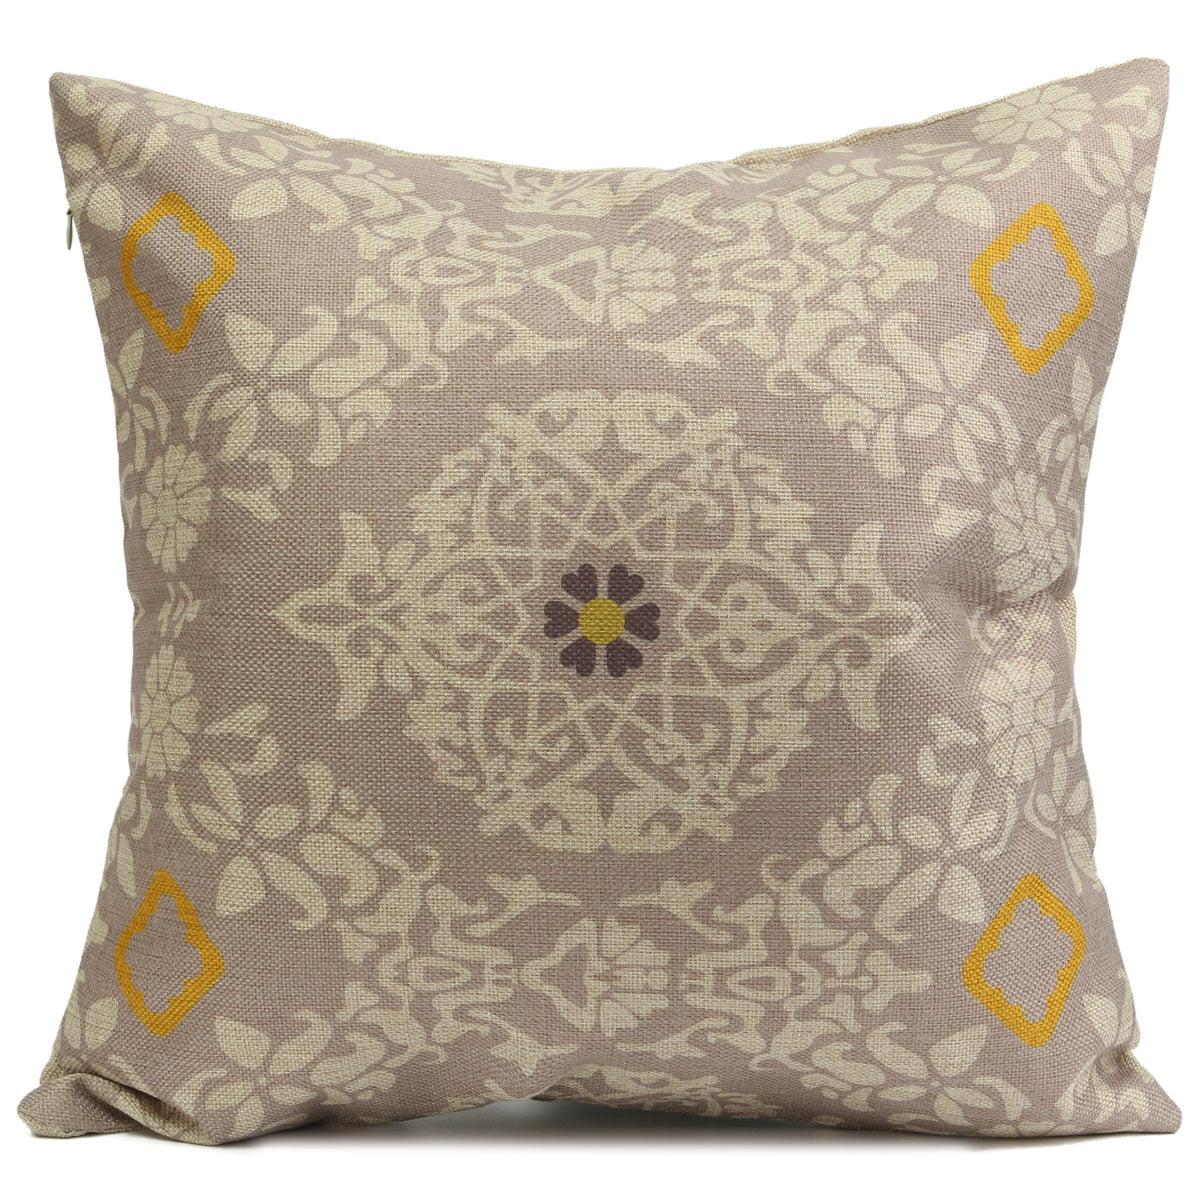 Retro Yellow Flower Flower Throw Pillow Cases Cushion